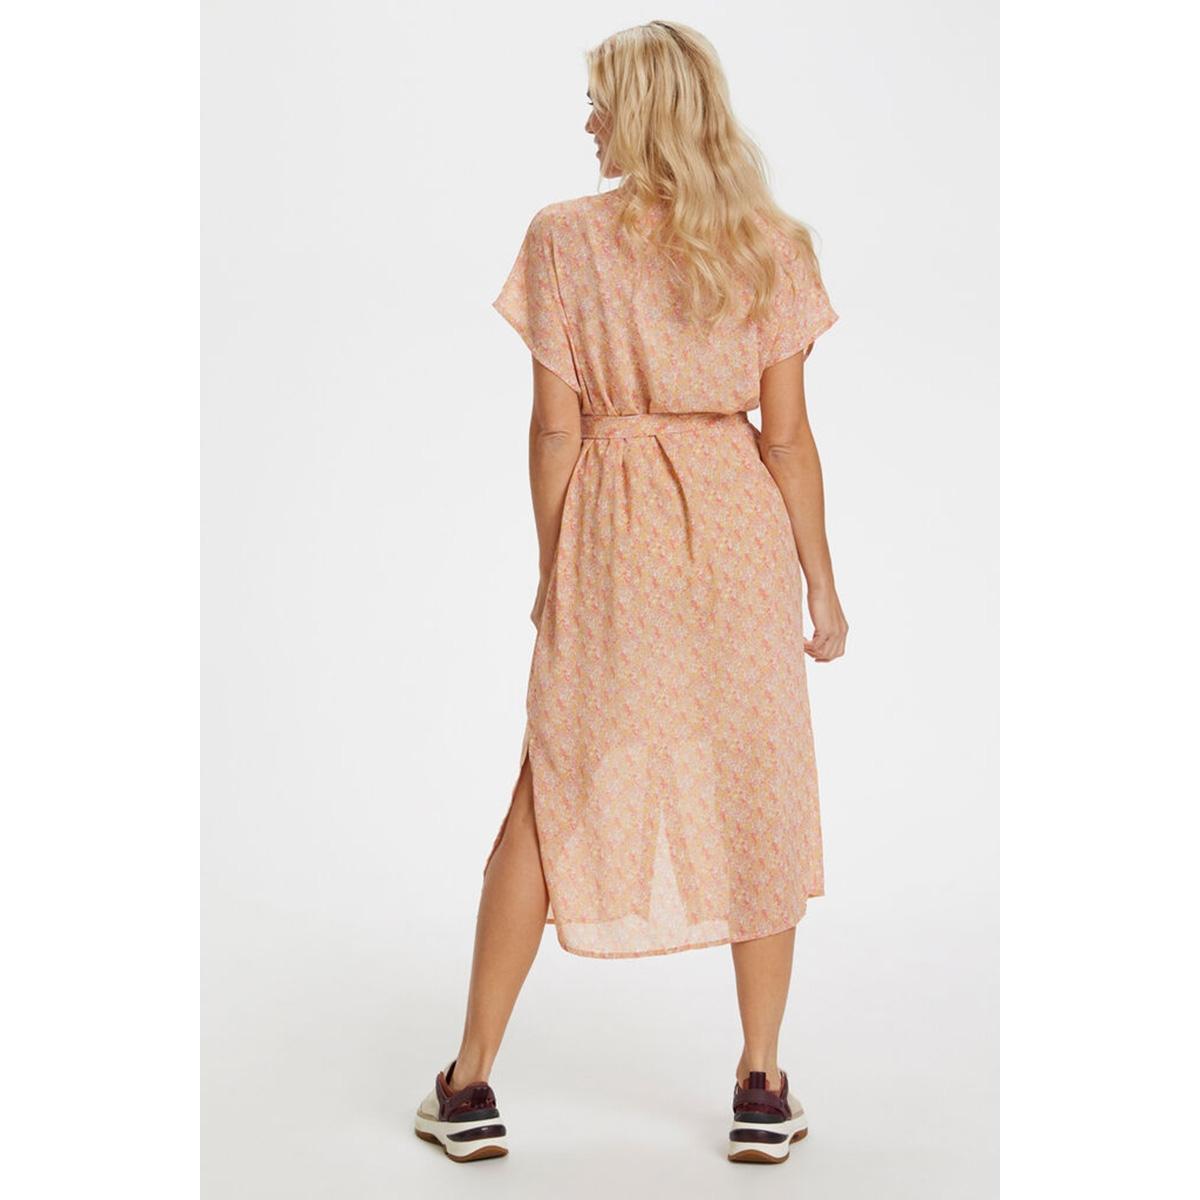 deasz desert woven dress priarie di 30510119 saint tropez jurk 151308